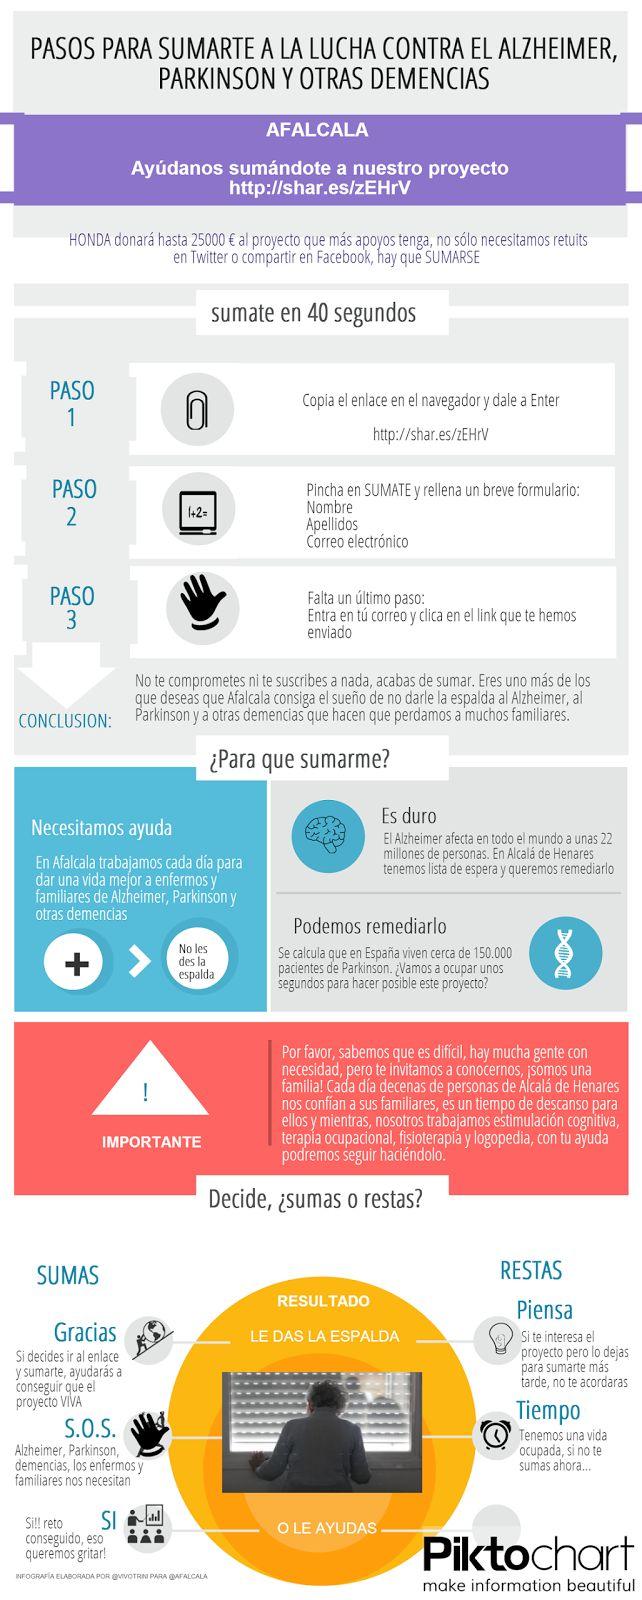 AFA Alcala: Suma contra el #Alzheimer, #Parkinson y otras demencias. #Infografia